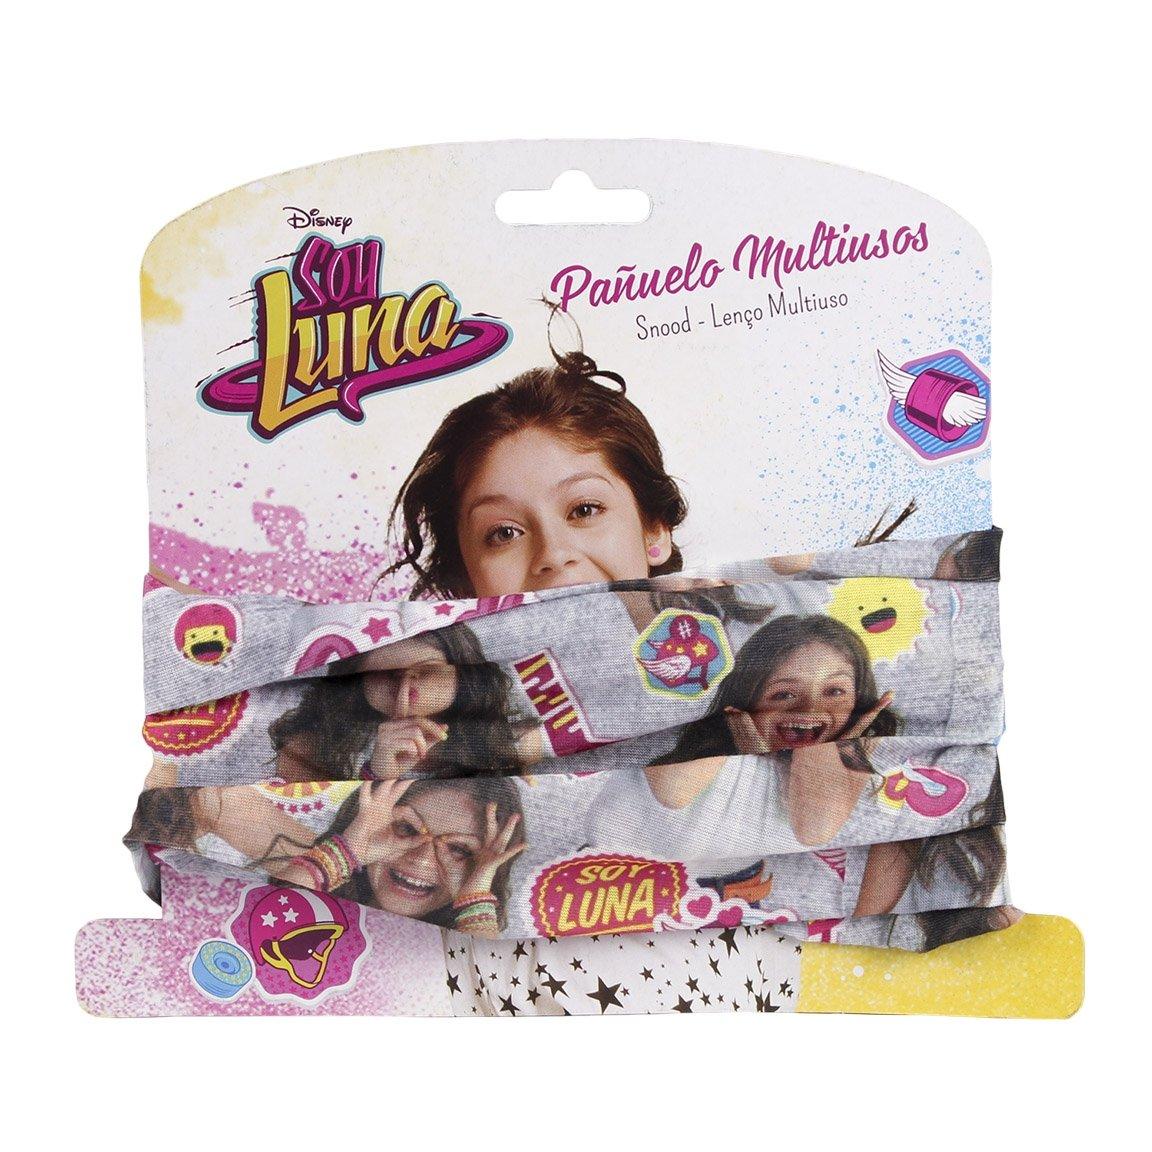 Disney Soy Luna Schal Stirnband